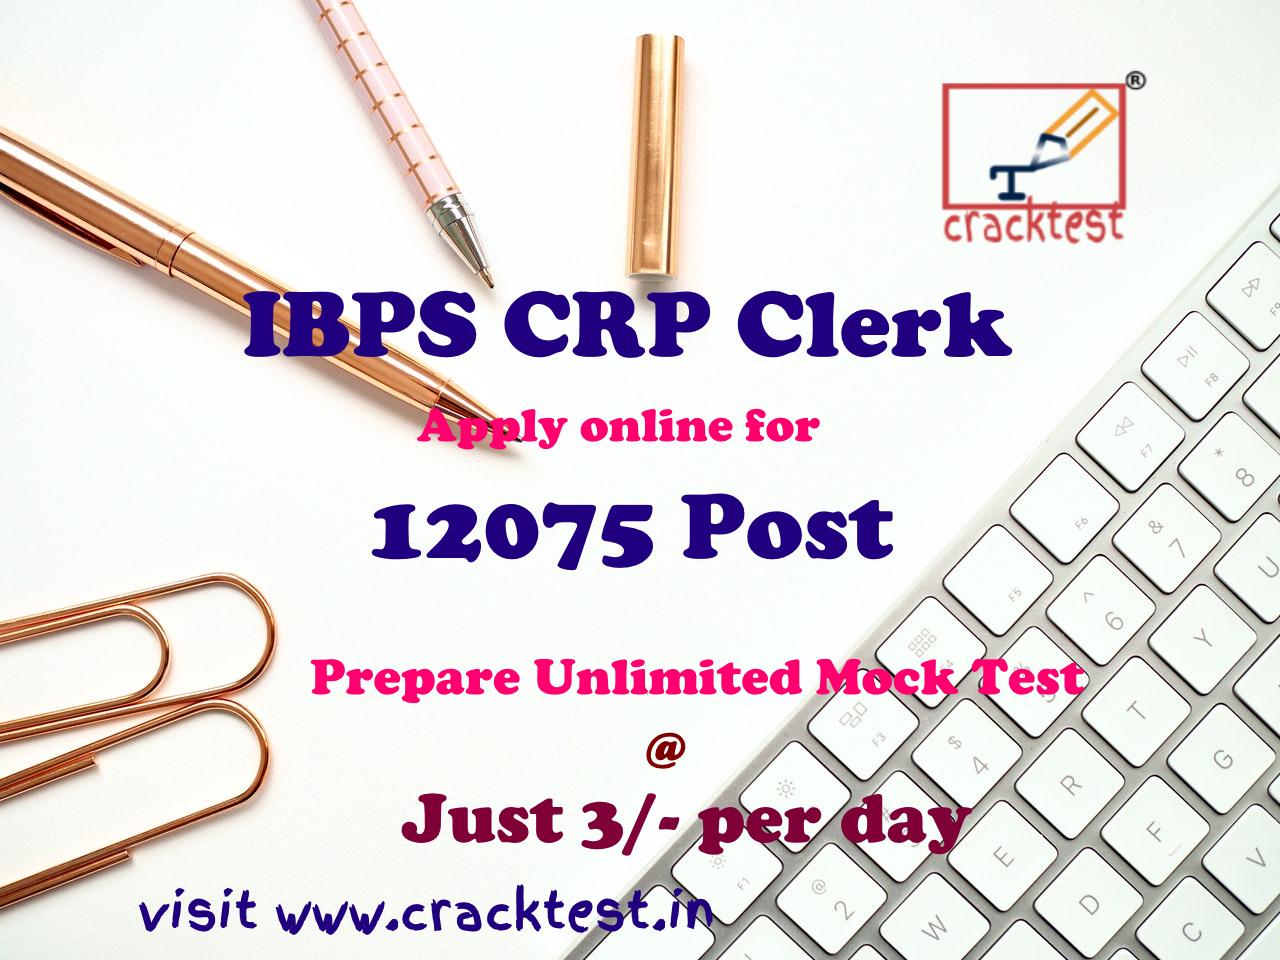 IBPS CRP Clerks -IX Online Form 2019 for 12075 vacancies